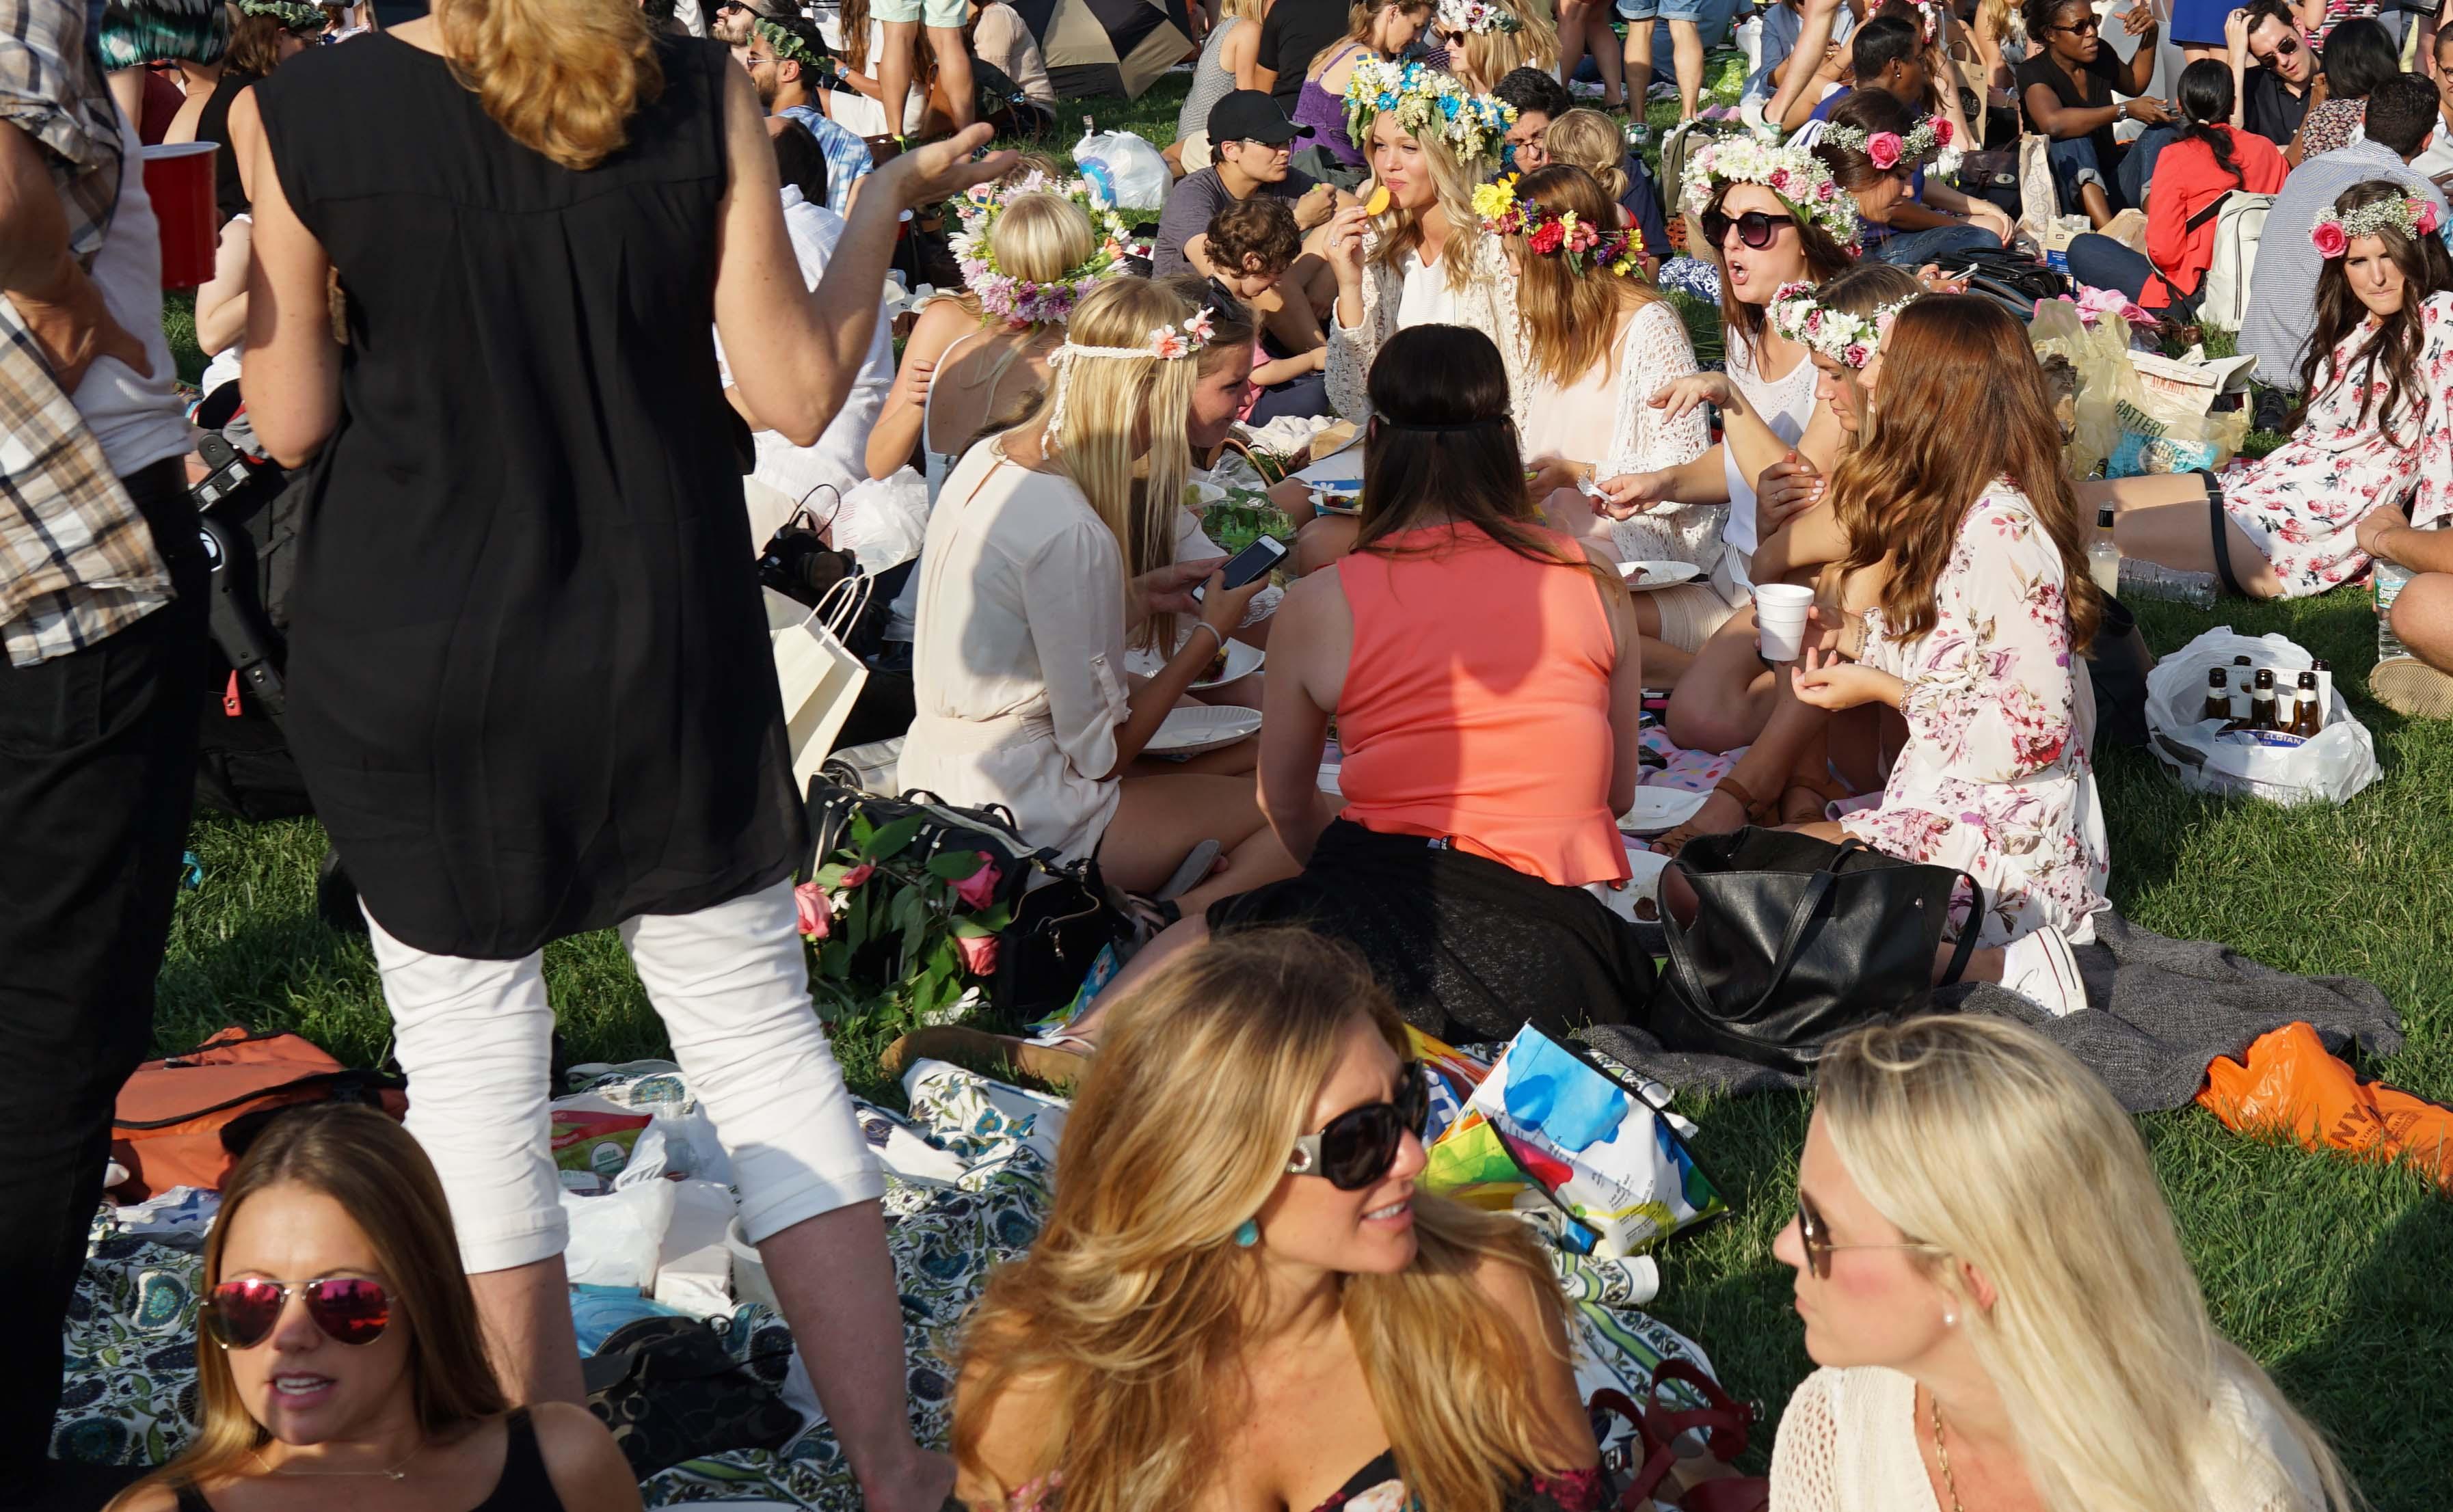 Swedish festival 3 girls on grass